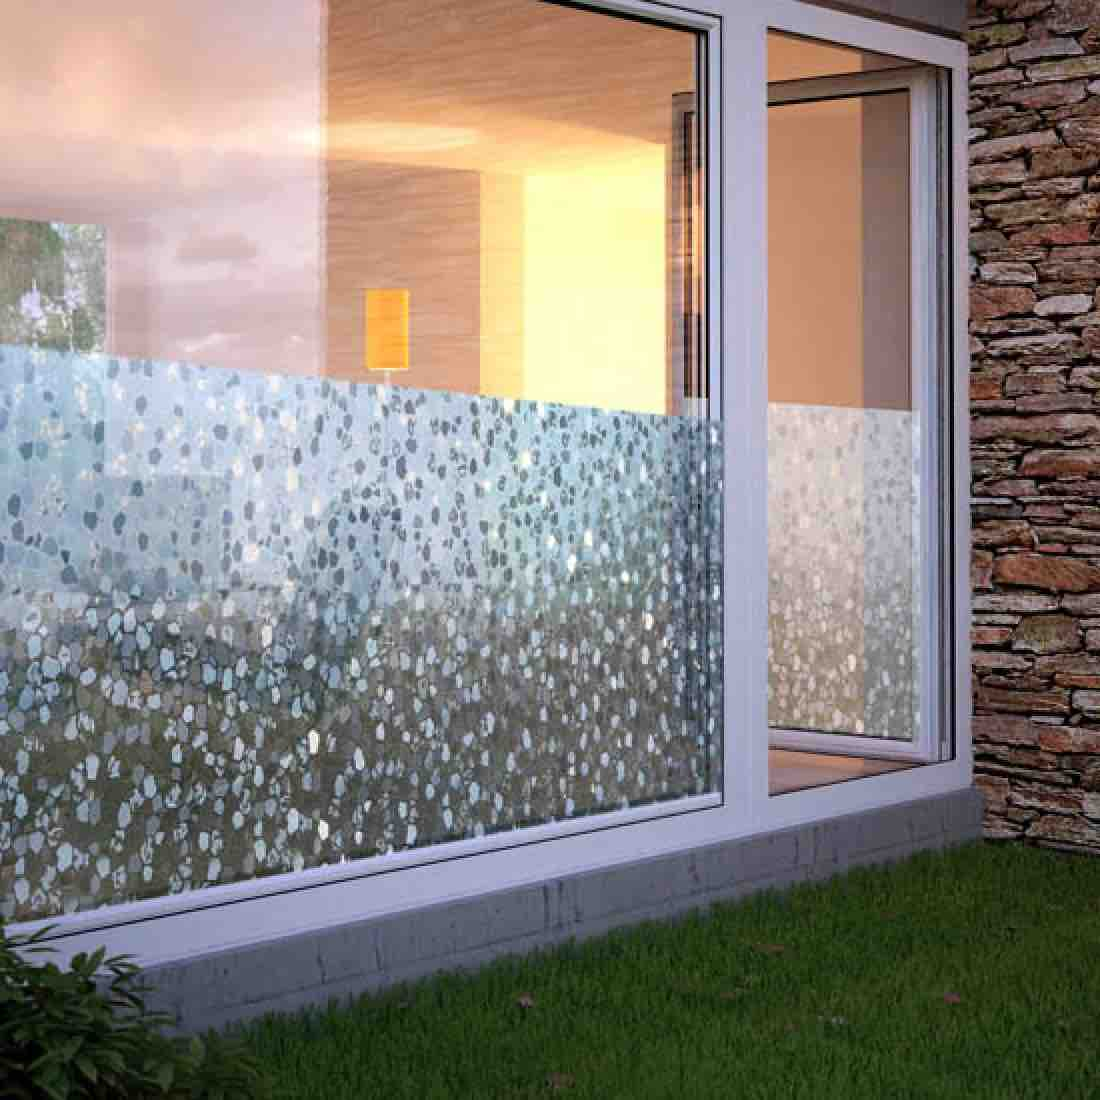 Full Size of Fensterfolien Sonnenschutz Statische Fensterfolie Ikea Entfernen Youtube Gegen Hitze Bad Obi Statisch Anbringen Selbstklebende Baumarkt Fenster Einbruchsicher Fenster Fenster Folie